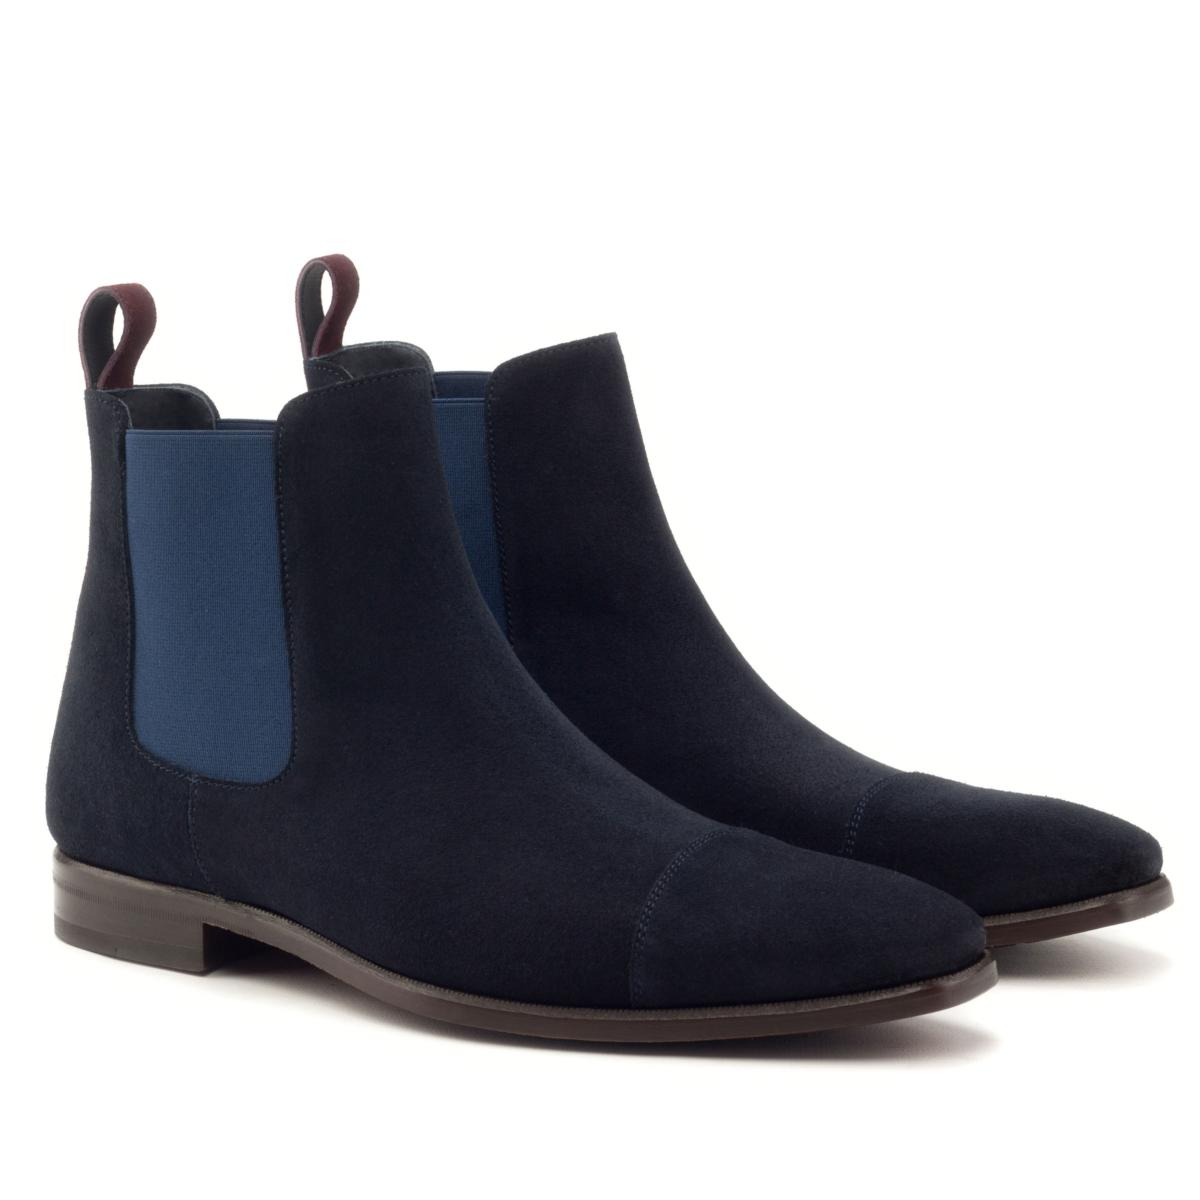 Chelsea boot for men in navy blue suede